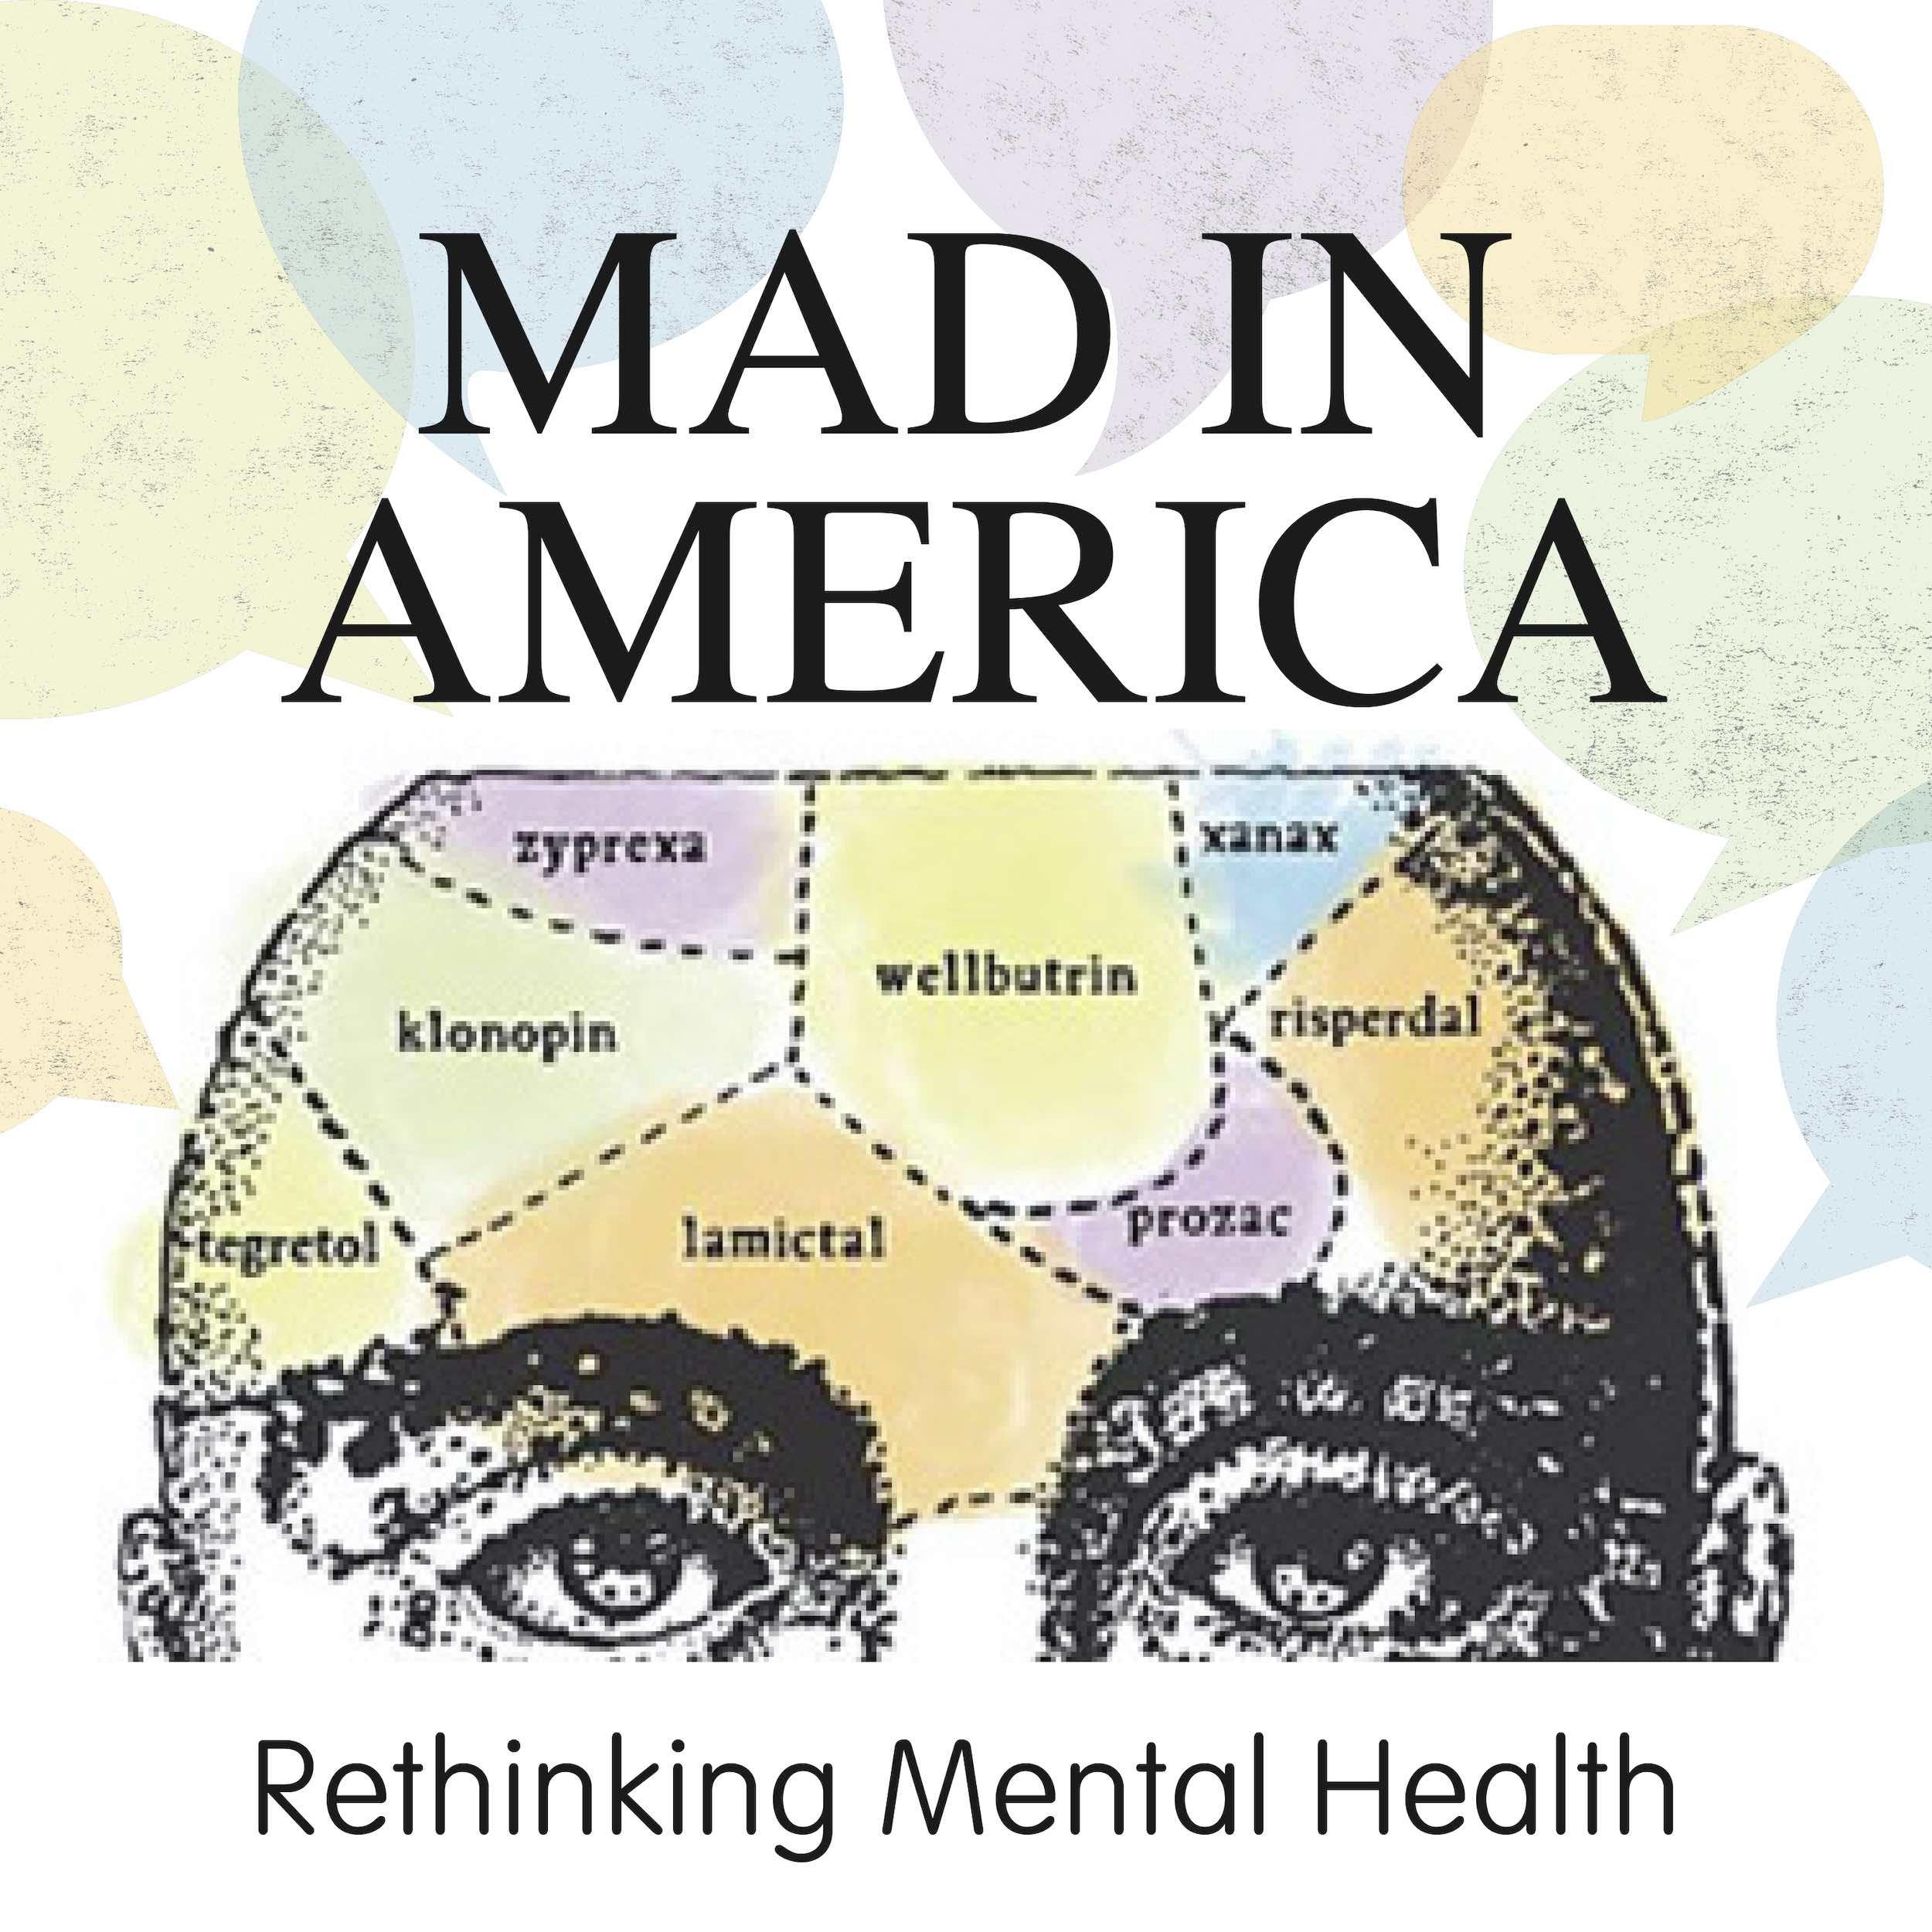 Mad in America: Rethinking Mental Health - Baylissa Frederick - World Benzodiazepine Awareness Day 2020